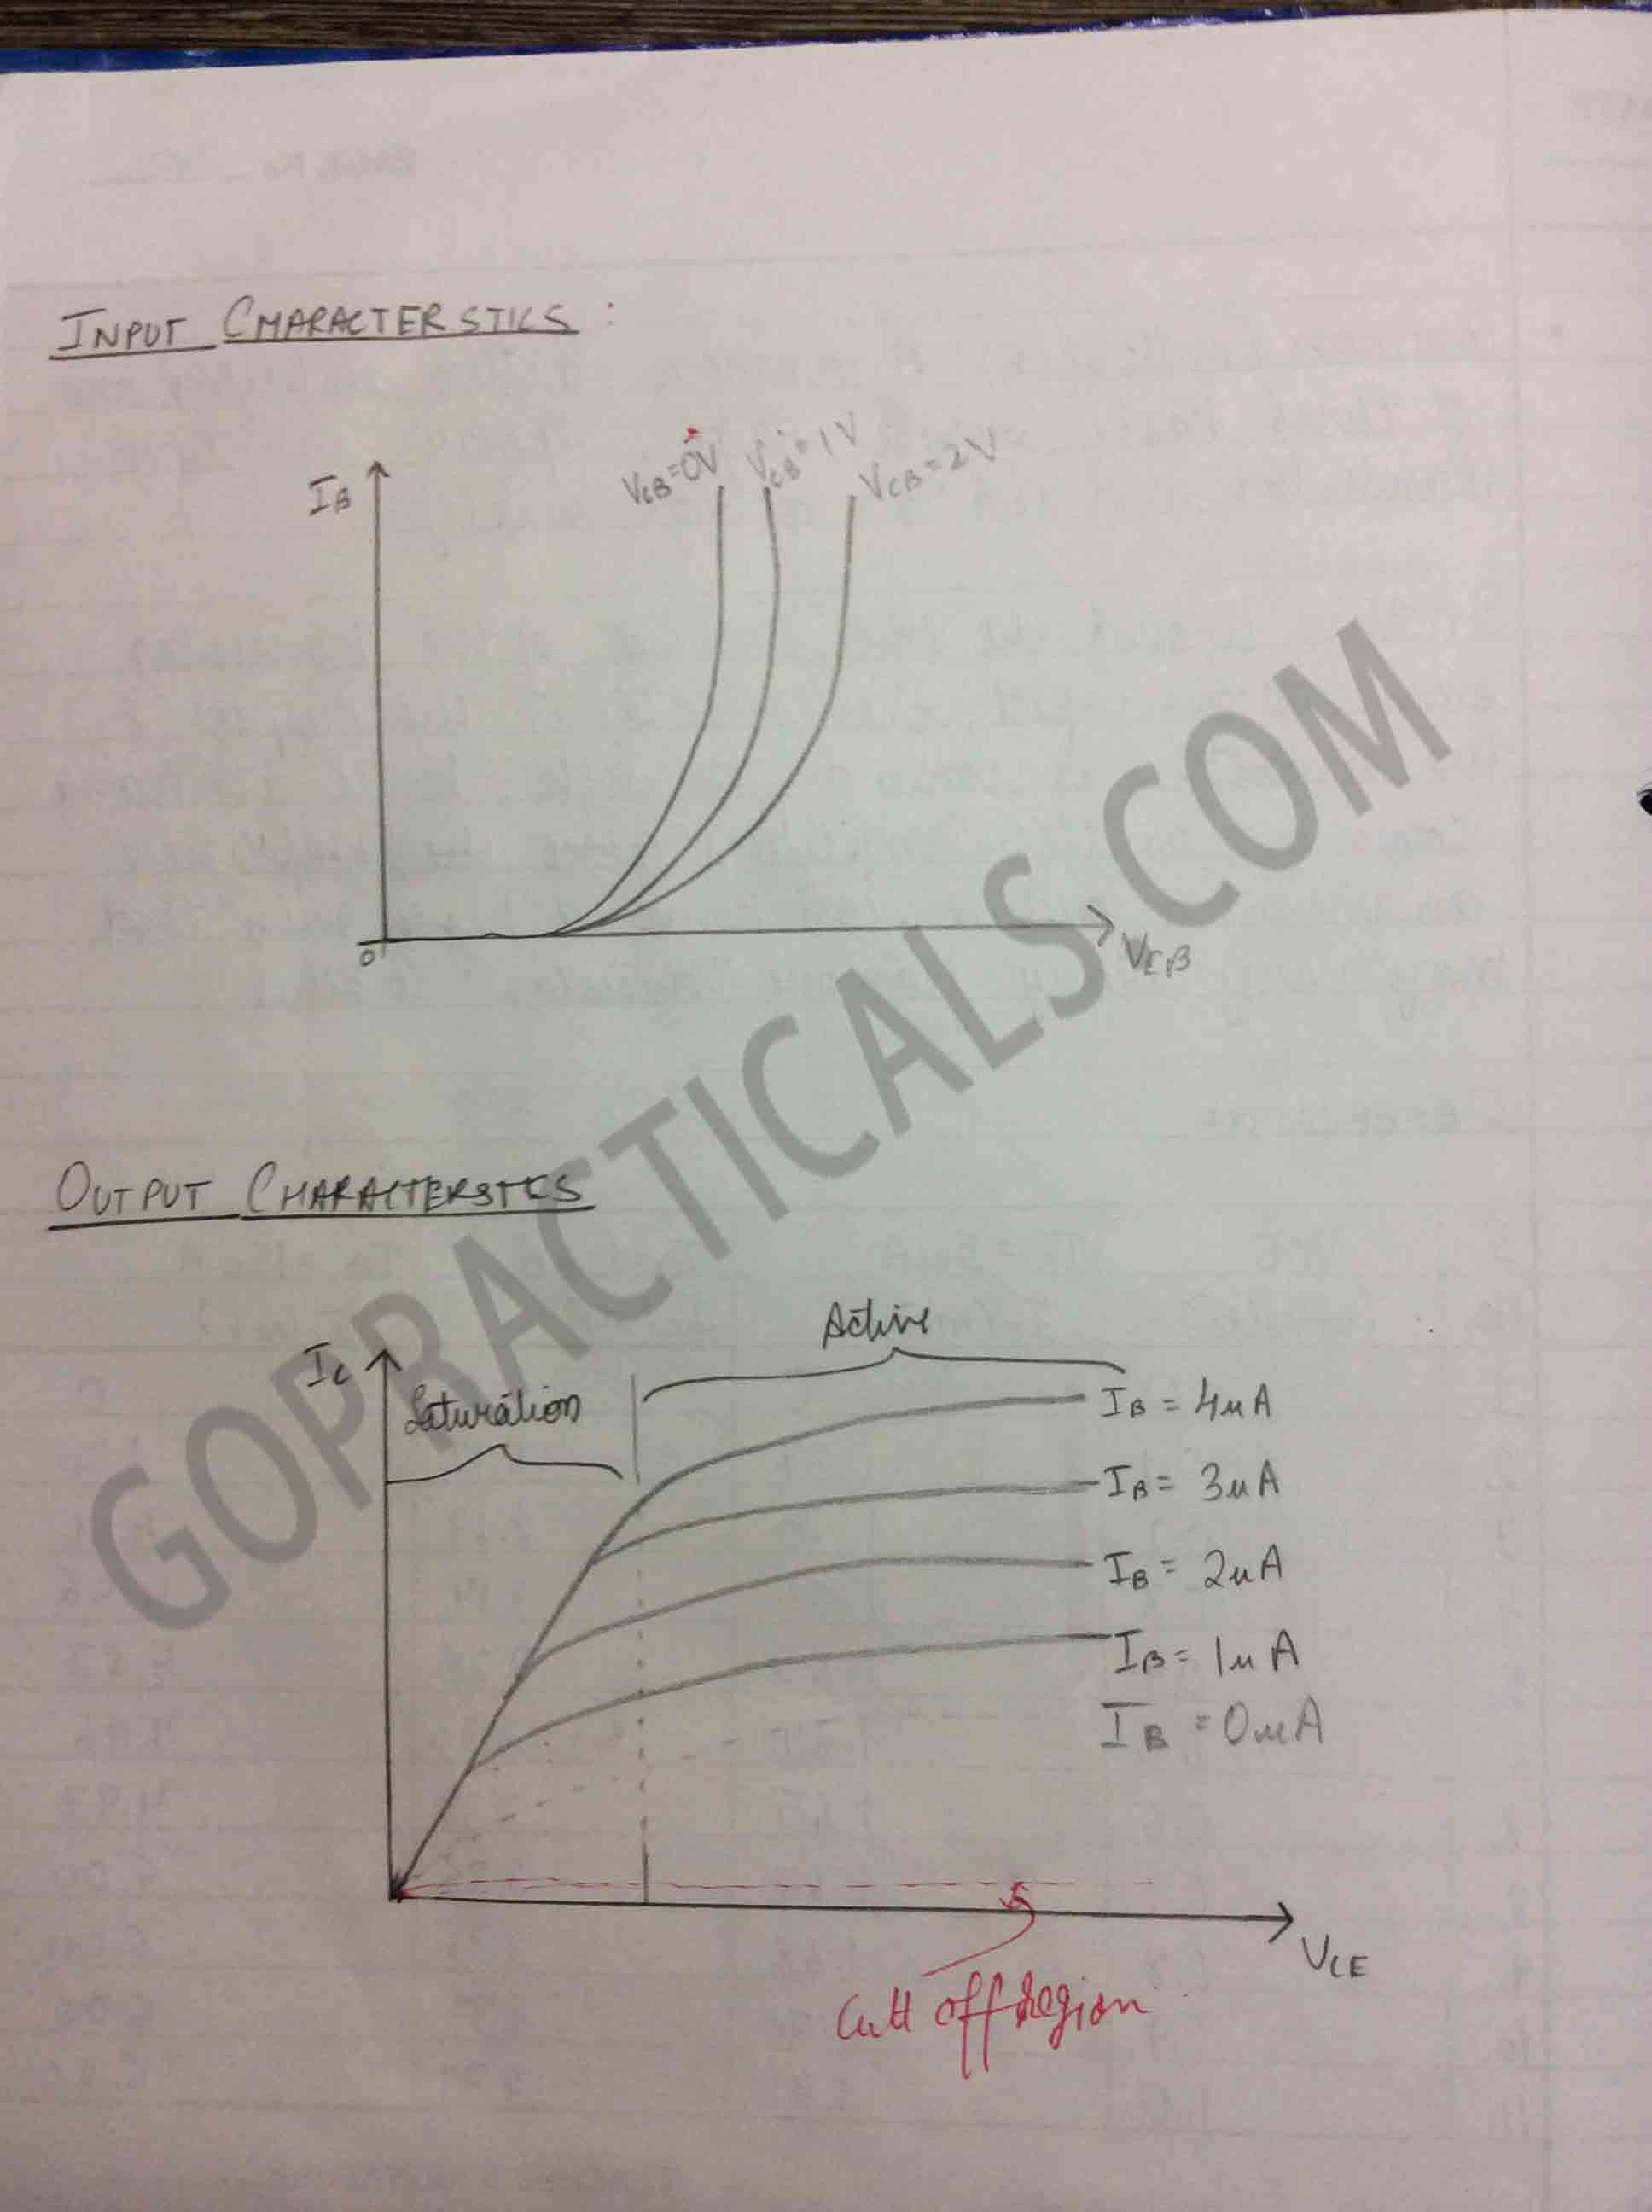 To study Transistor Input/Output Characteristics-6